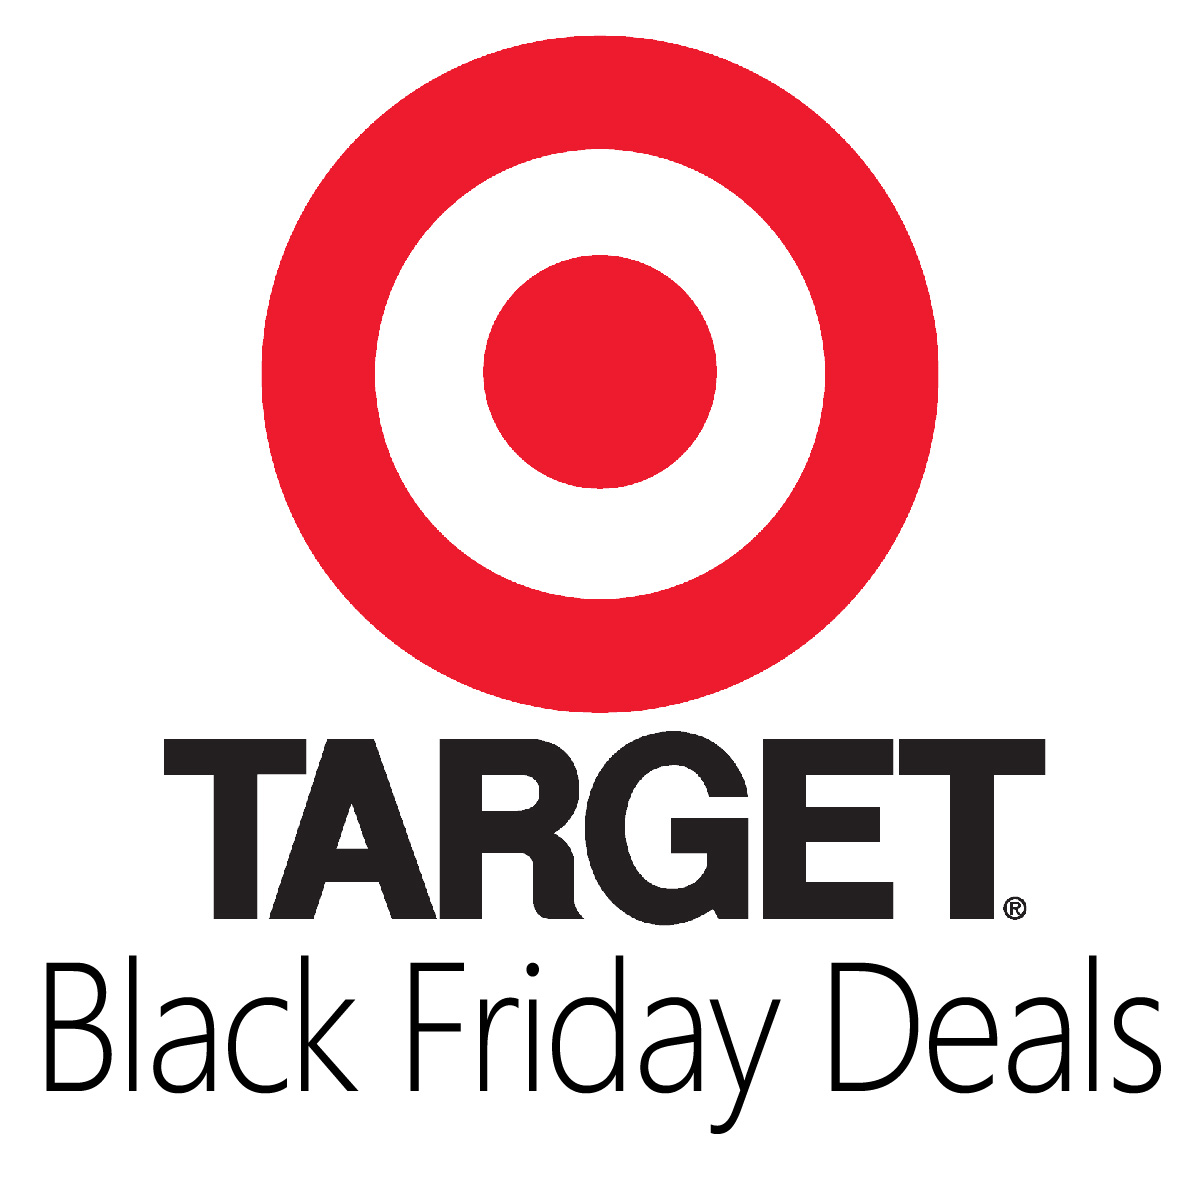 Target's Black Friday Deals Gift List